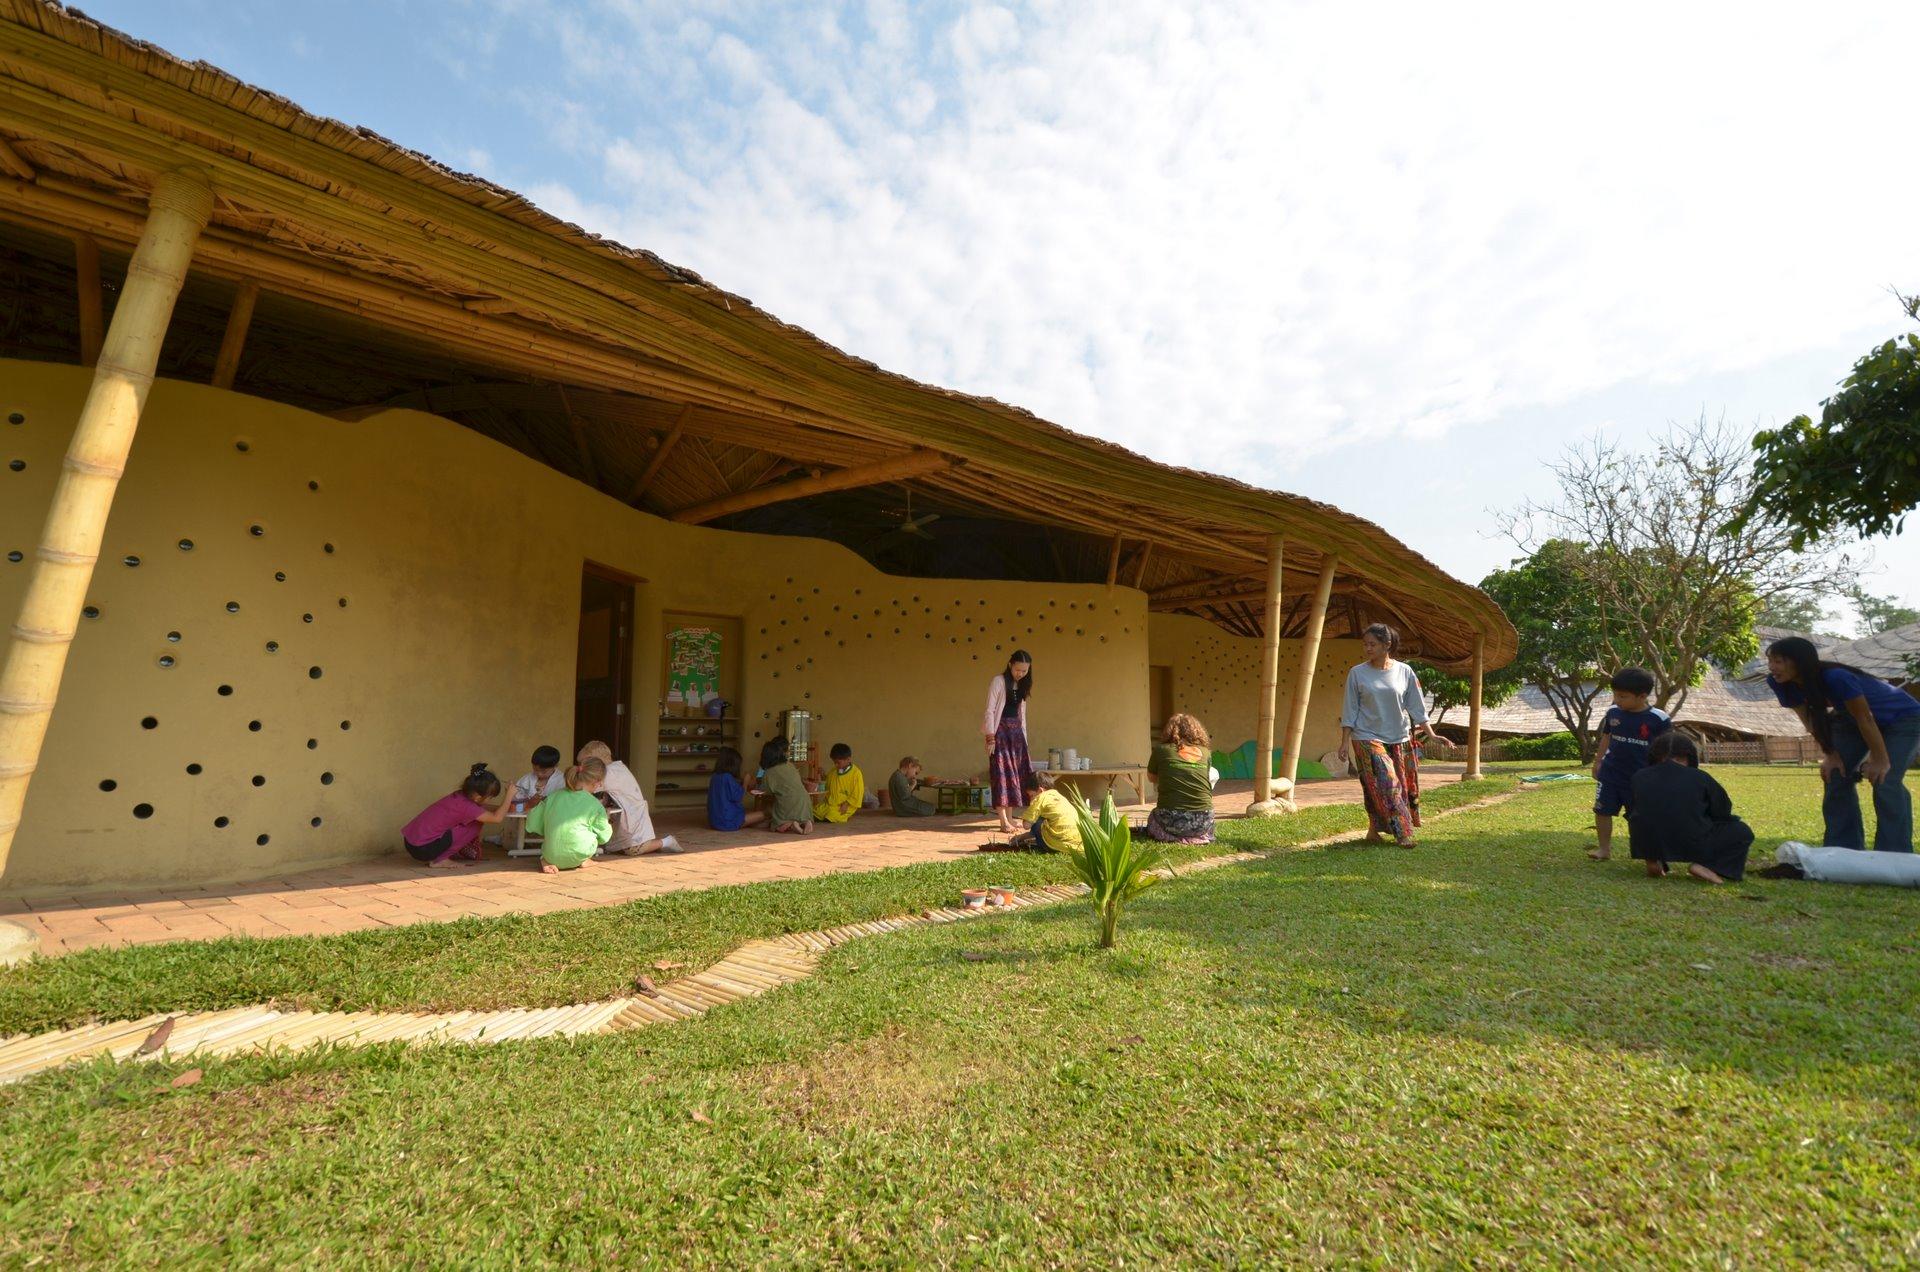 Panyaden International School adobe classrooms